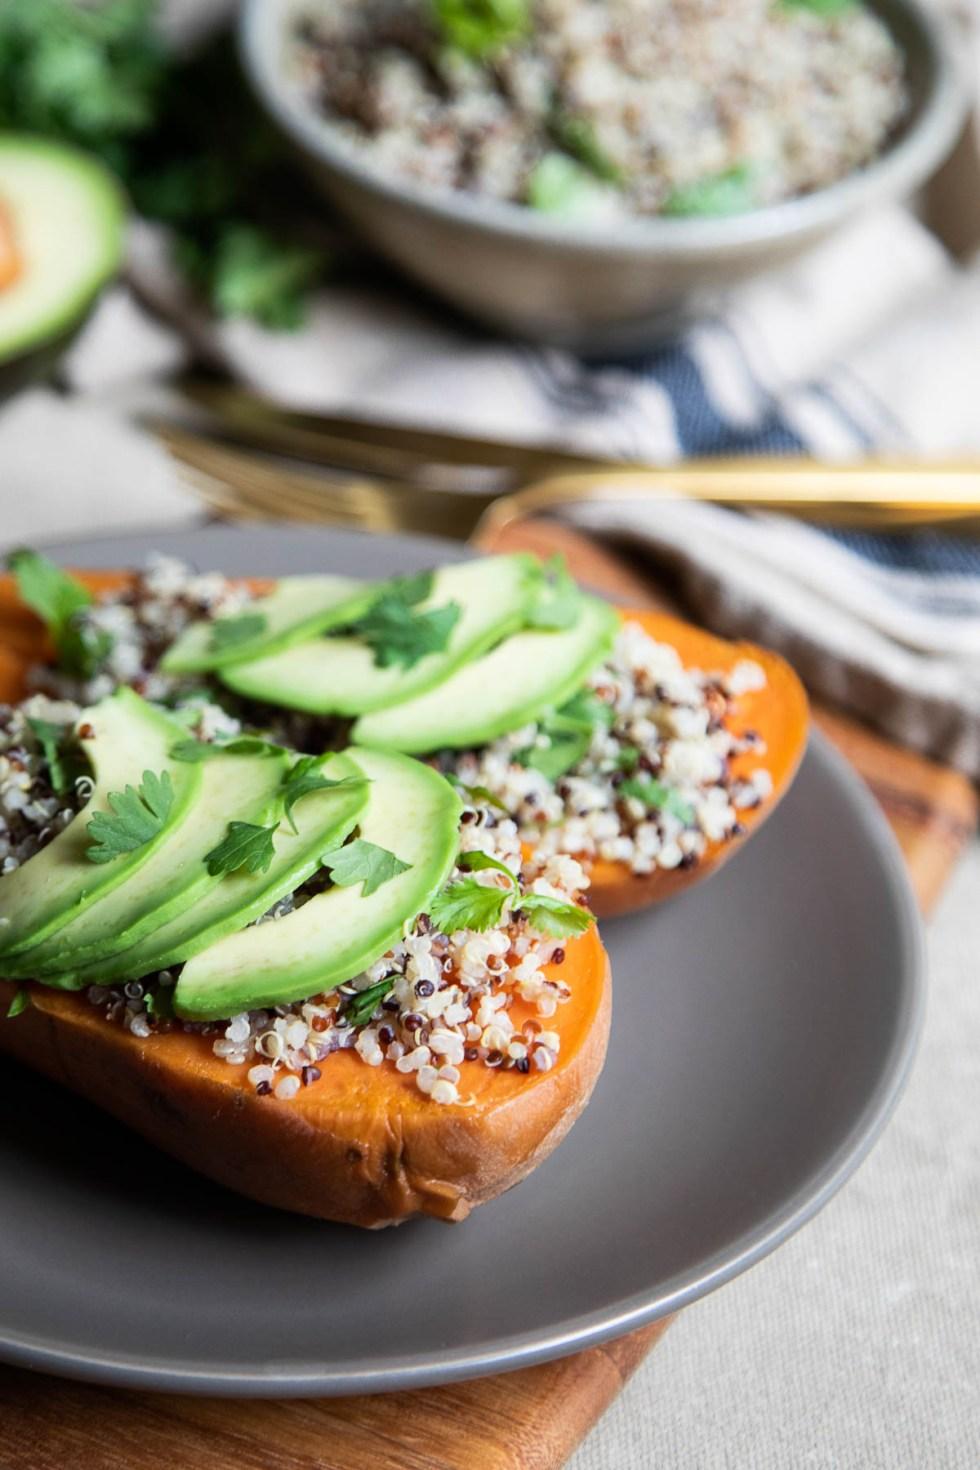 Quinoa Stuffed Sweet Potatoes with Avocado Slices